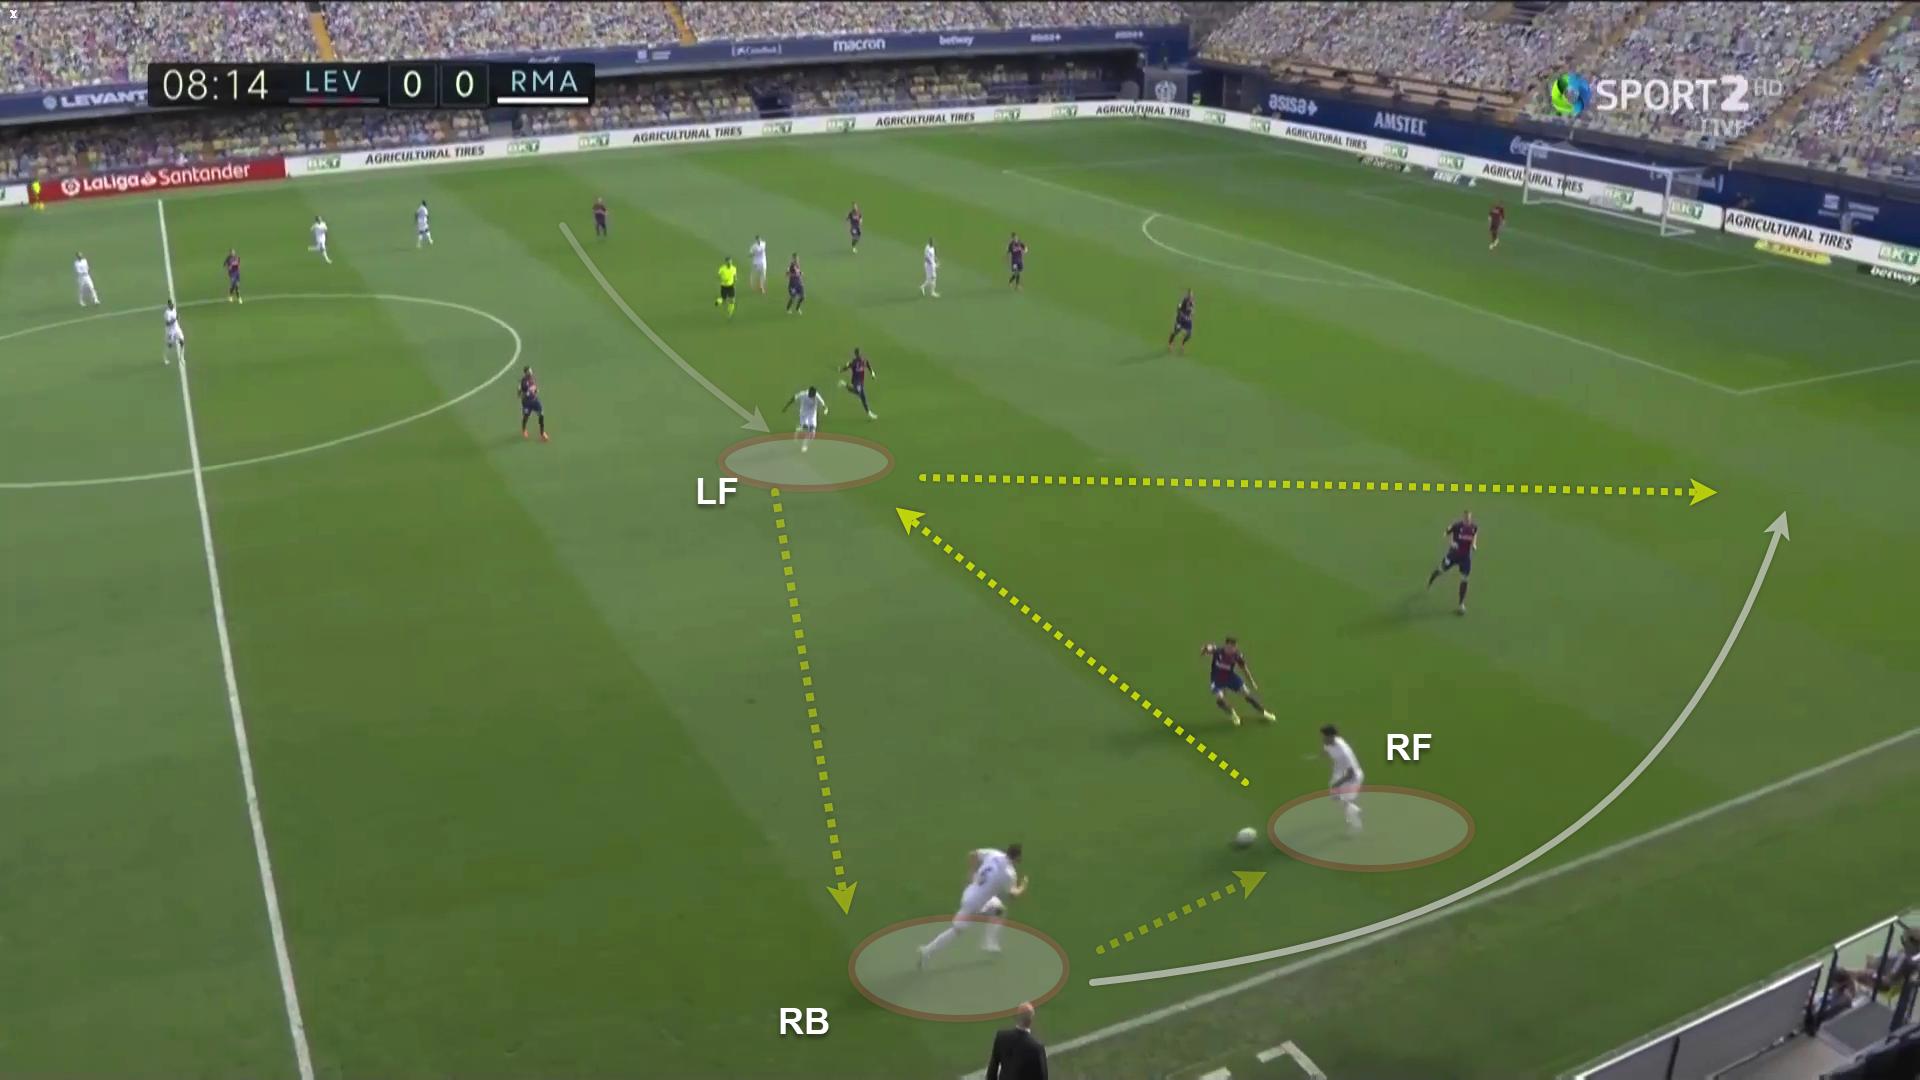 La Liga 2020/21: Levante vs Real Madrid - tactical analysis